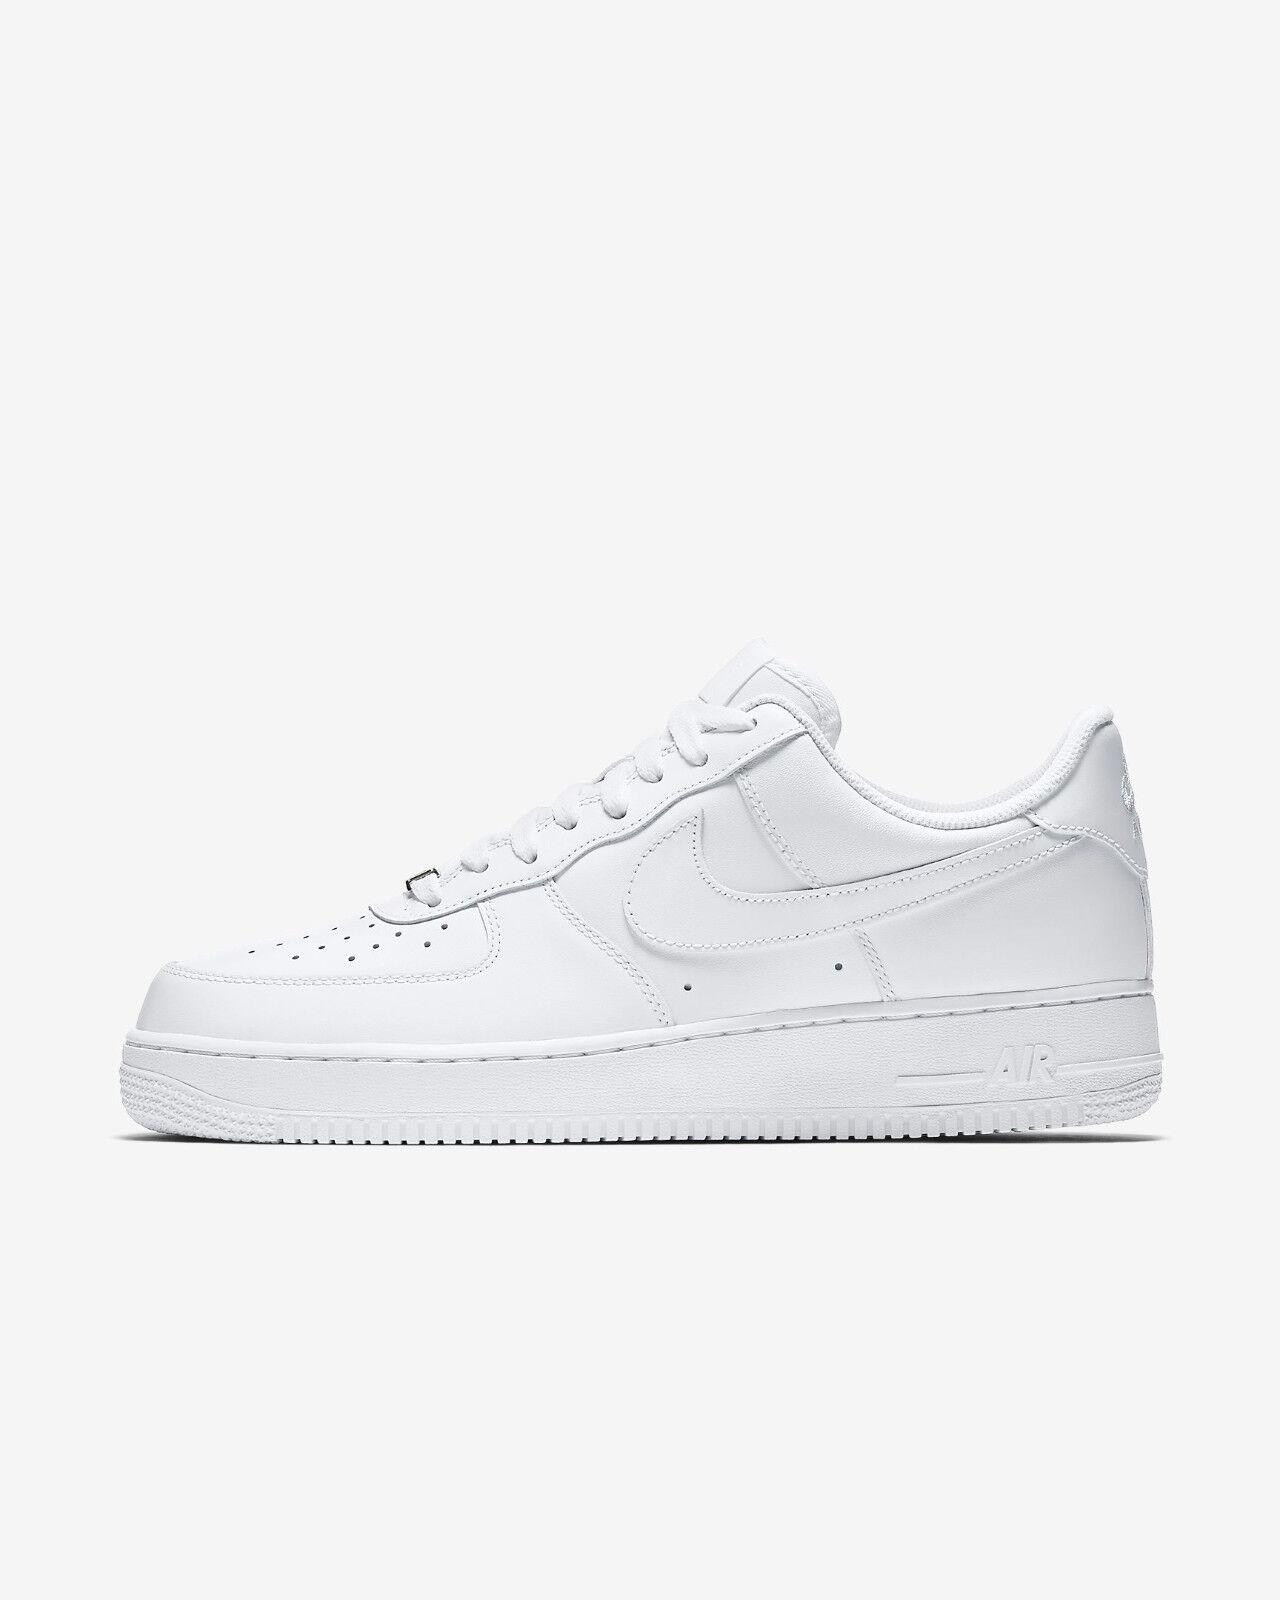 Scarpe Nike White Air Force One '07 White Nike Bianco Original Shoes Uomo Donna 315122-111 48dedd